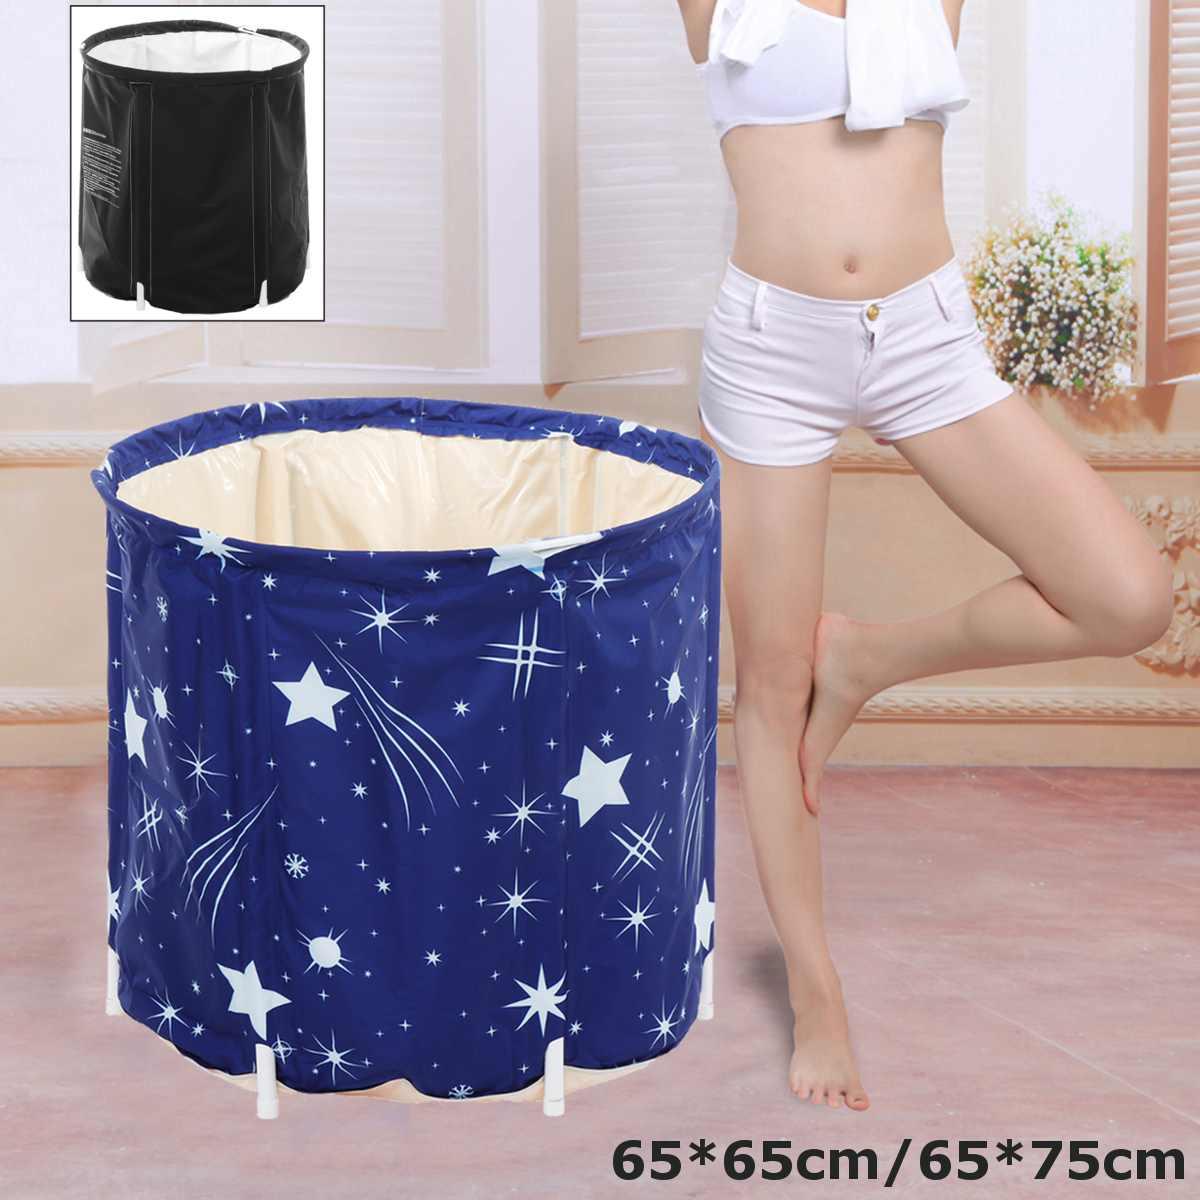 Full-body Folding Detachable Adult  Portable Travel Home Home Bath Bucket Insulation Massage Pool Bathing Warm